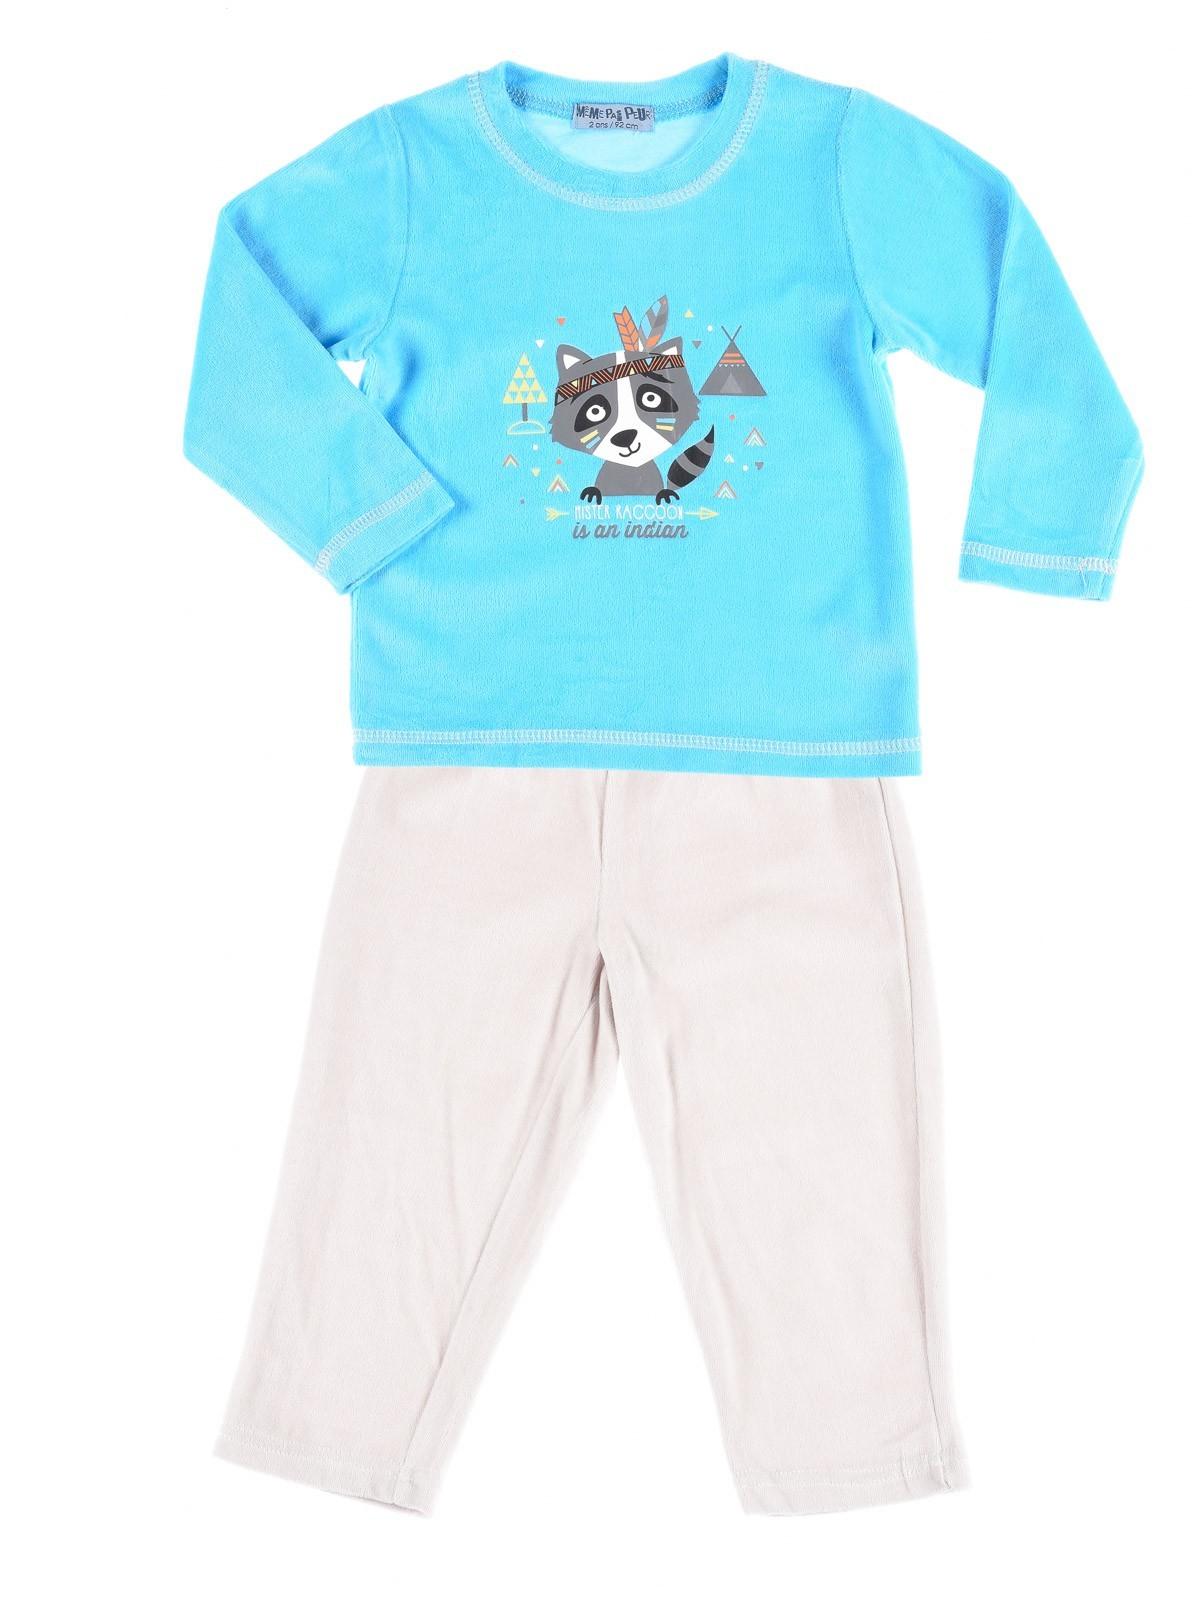 Pyjama Garon Raton Laveur 2 6A DistriCenter